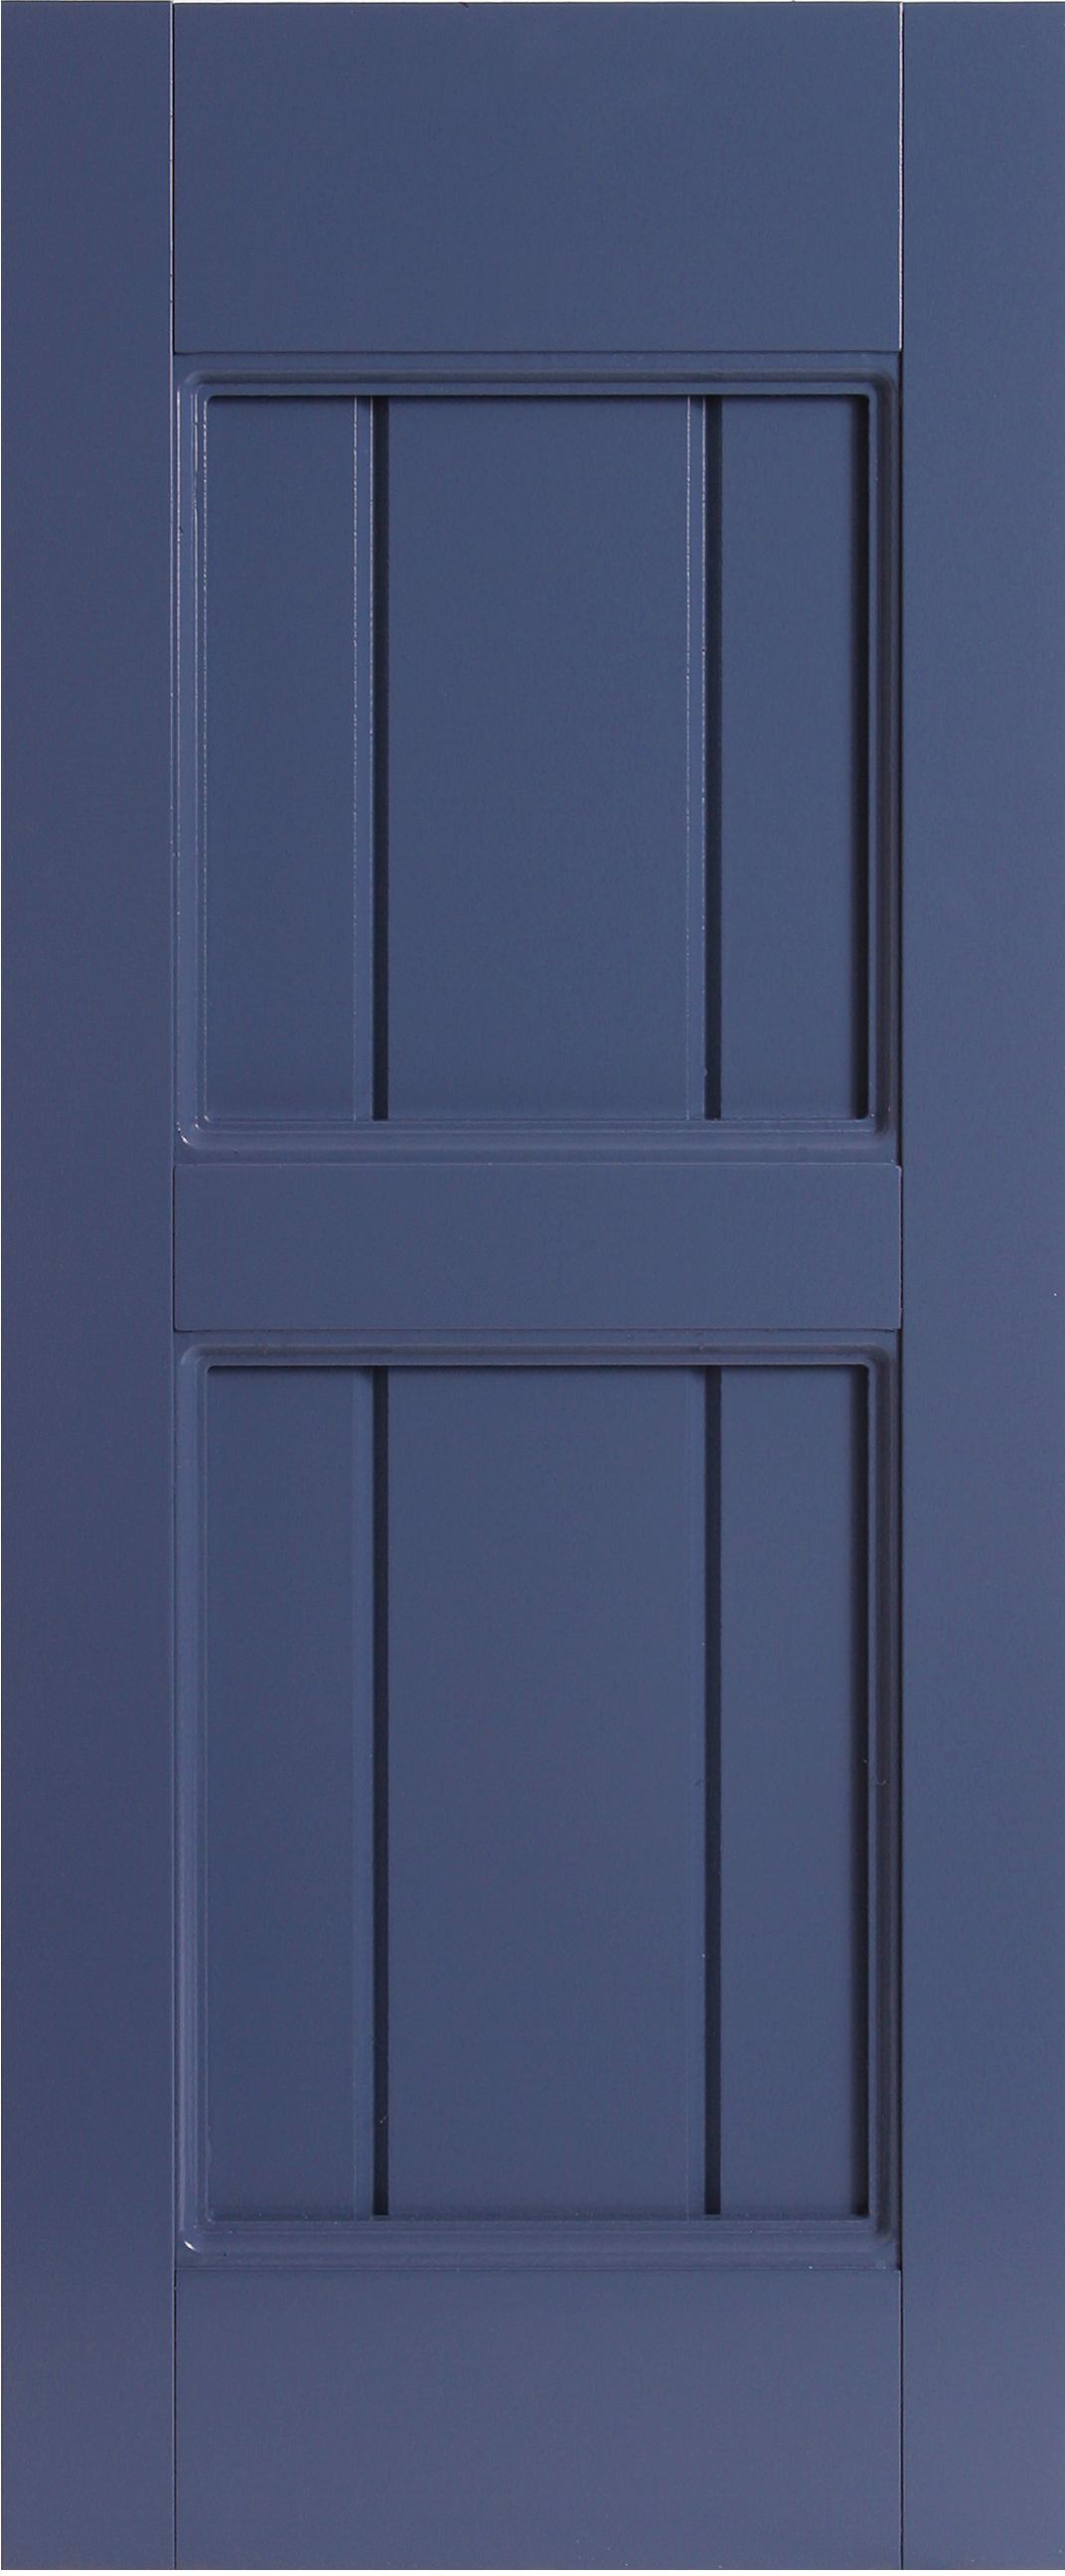 Composite wood siding panels exterior - Framed Board Amp Batten Exterior Shutters Shutters Composite